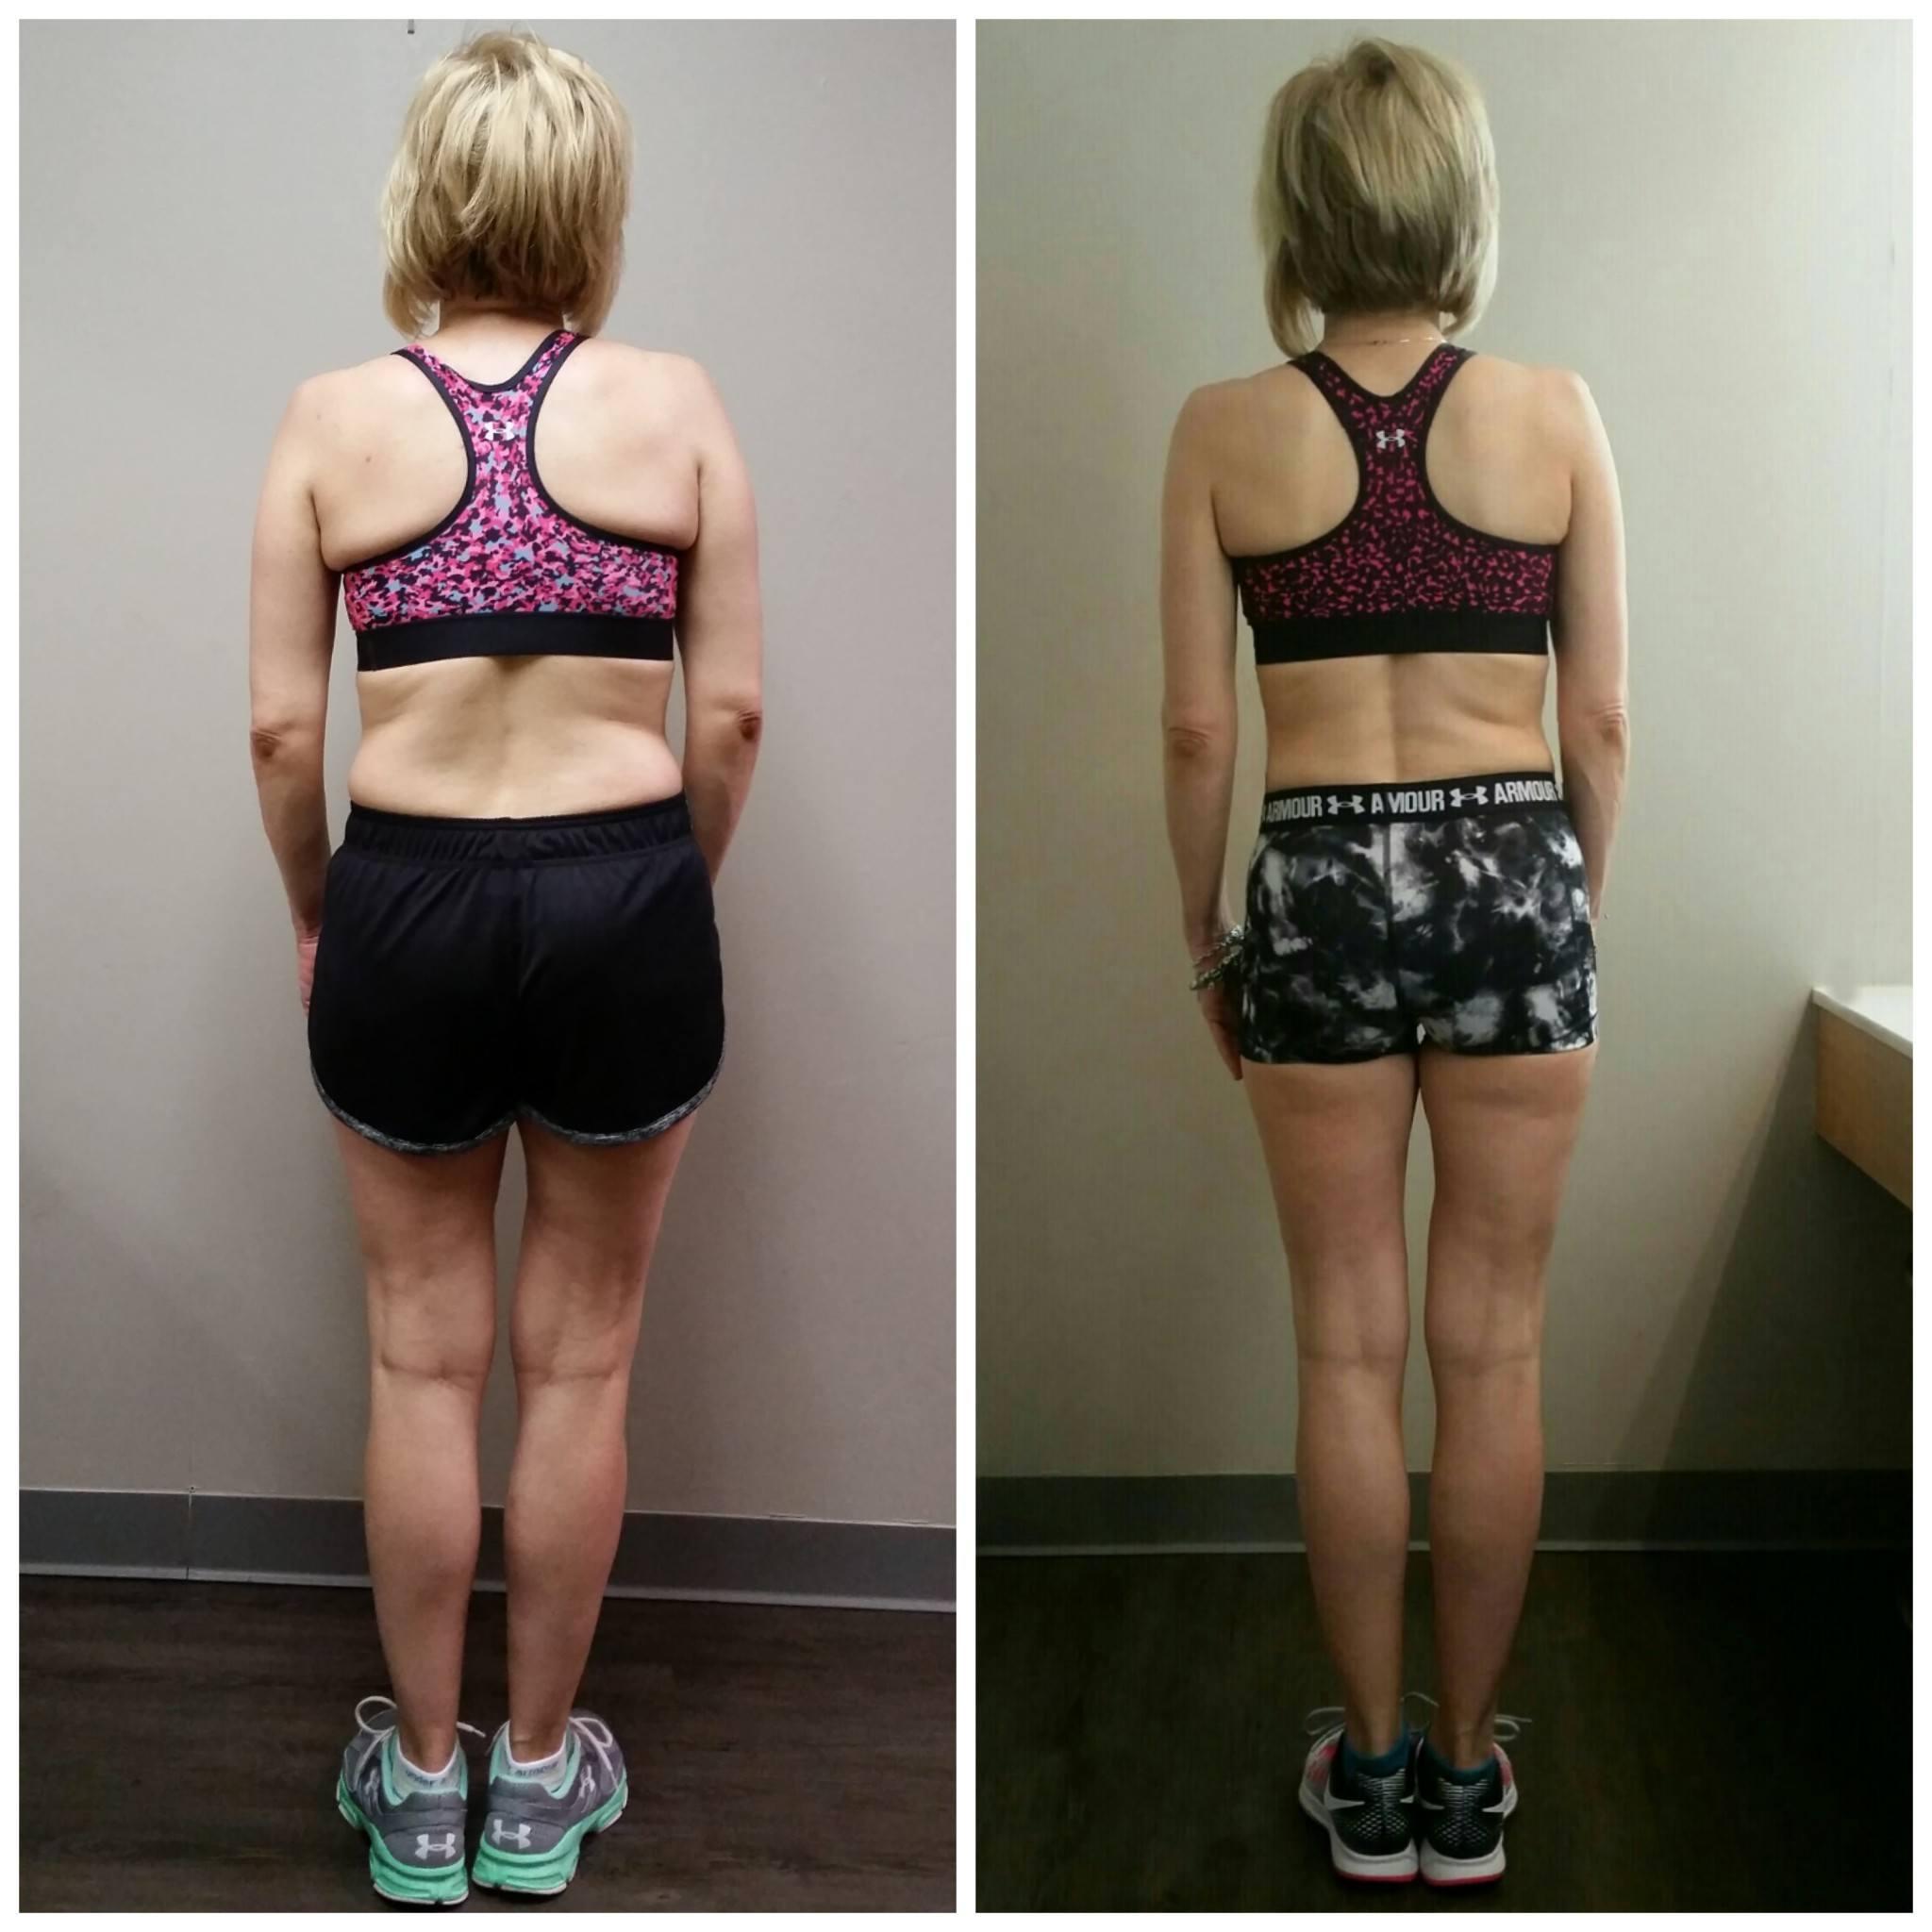 Linda female top personal trainer Dallas